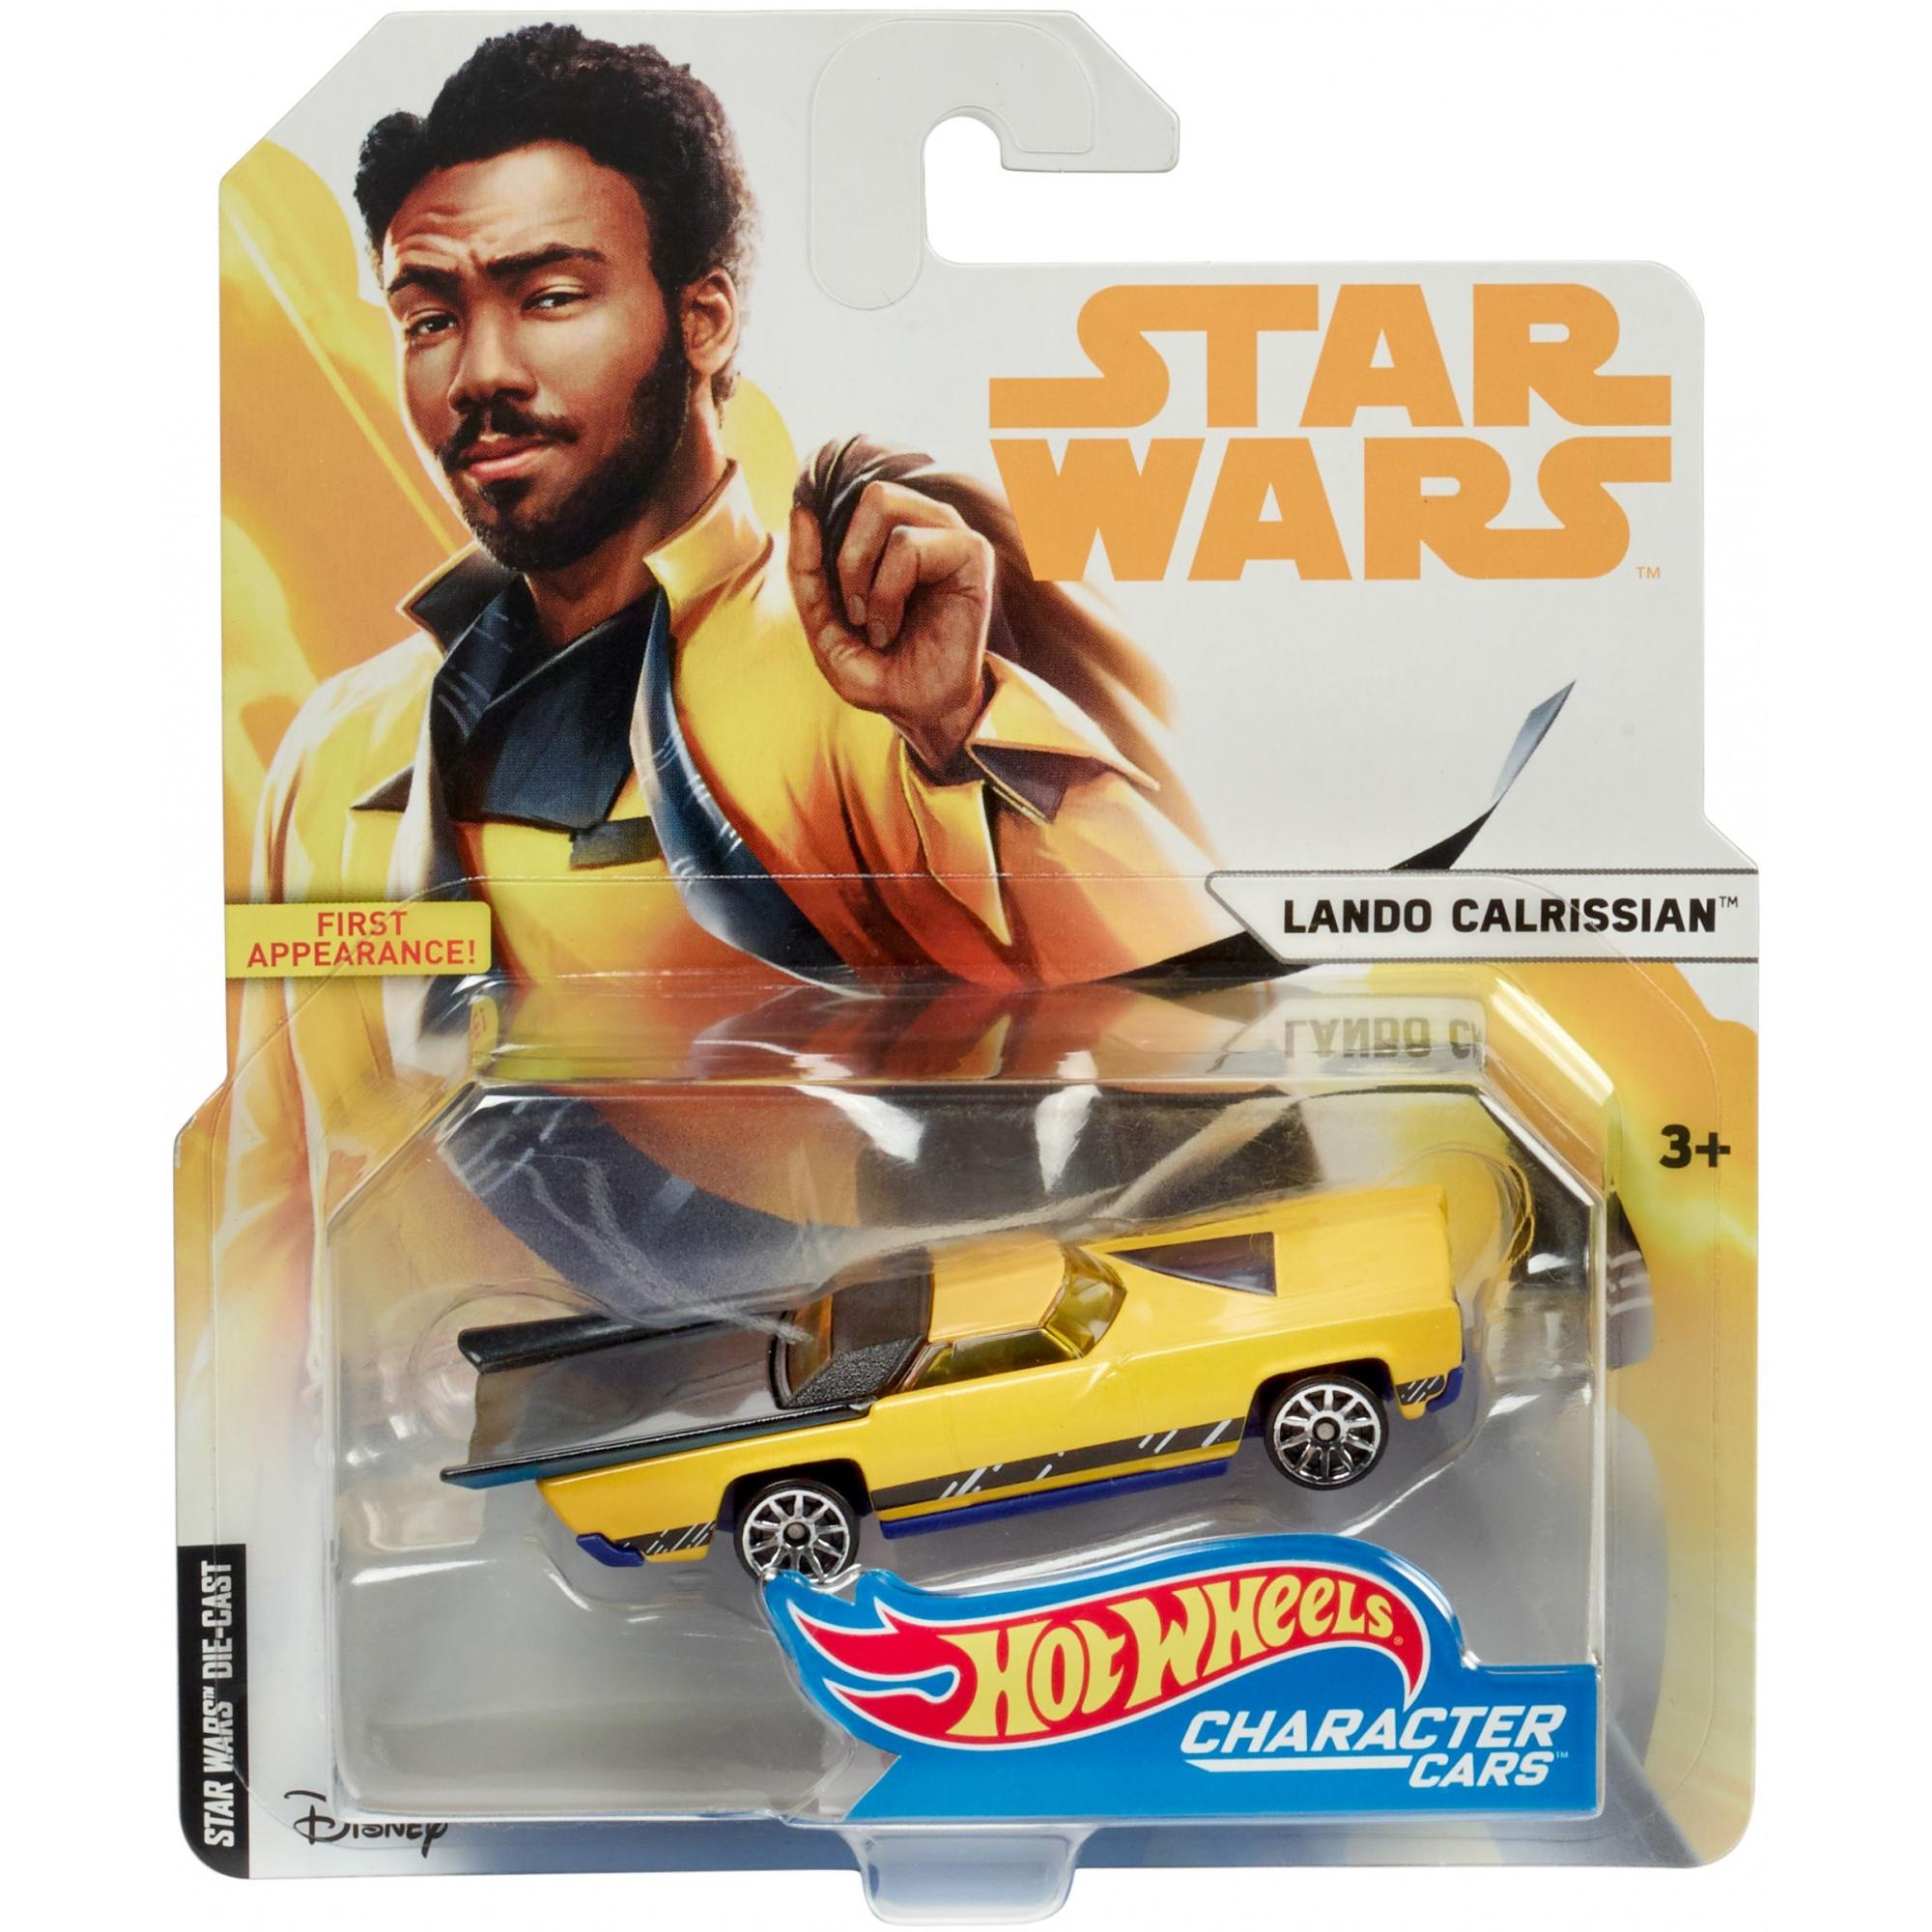 Solo: ASWS HW Lando Calrissian Character Car 1